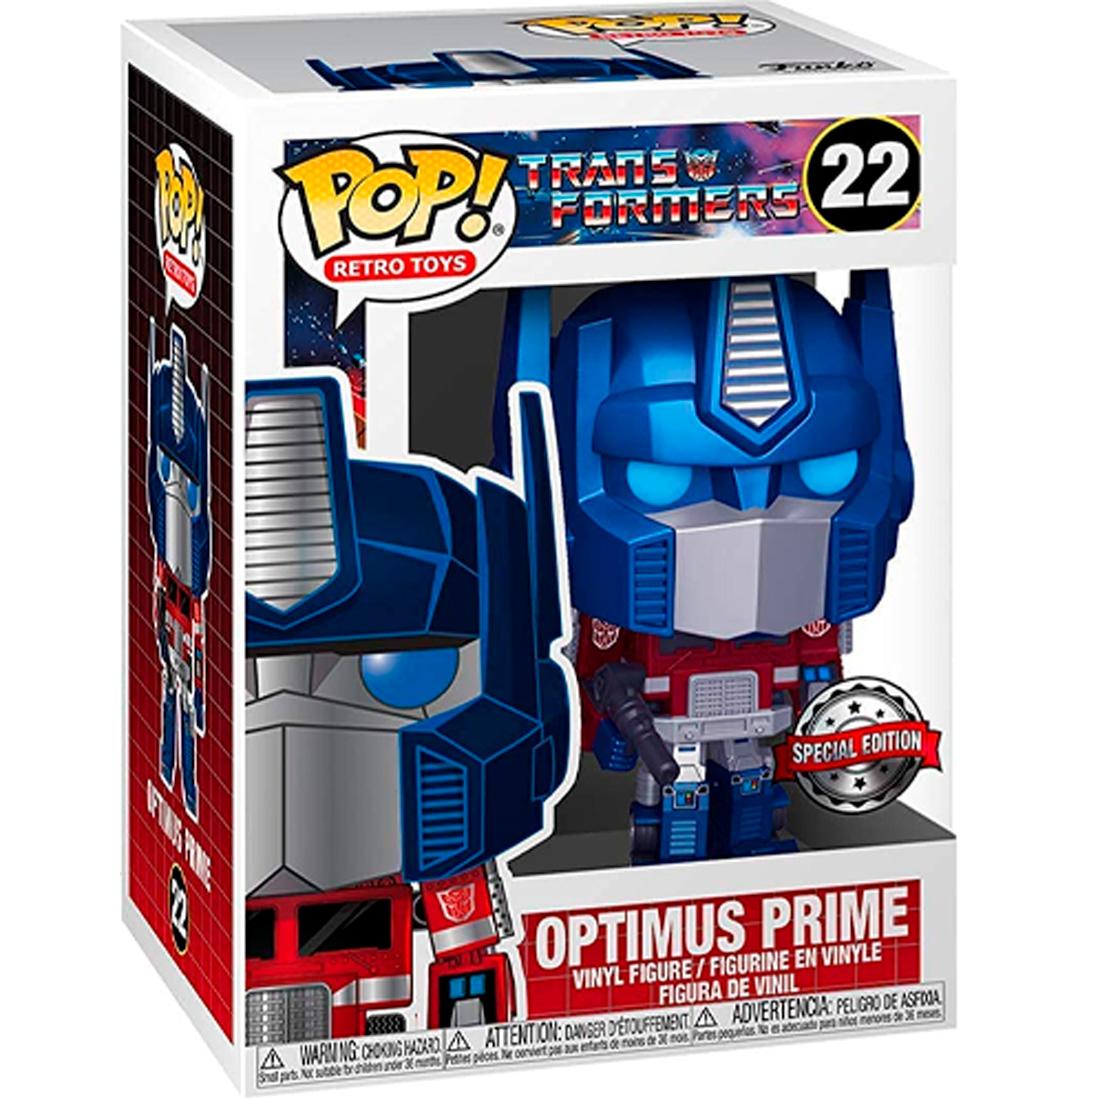 Funko Pop Retro Toys Transformers 22 Optimus Prime Special Edition